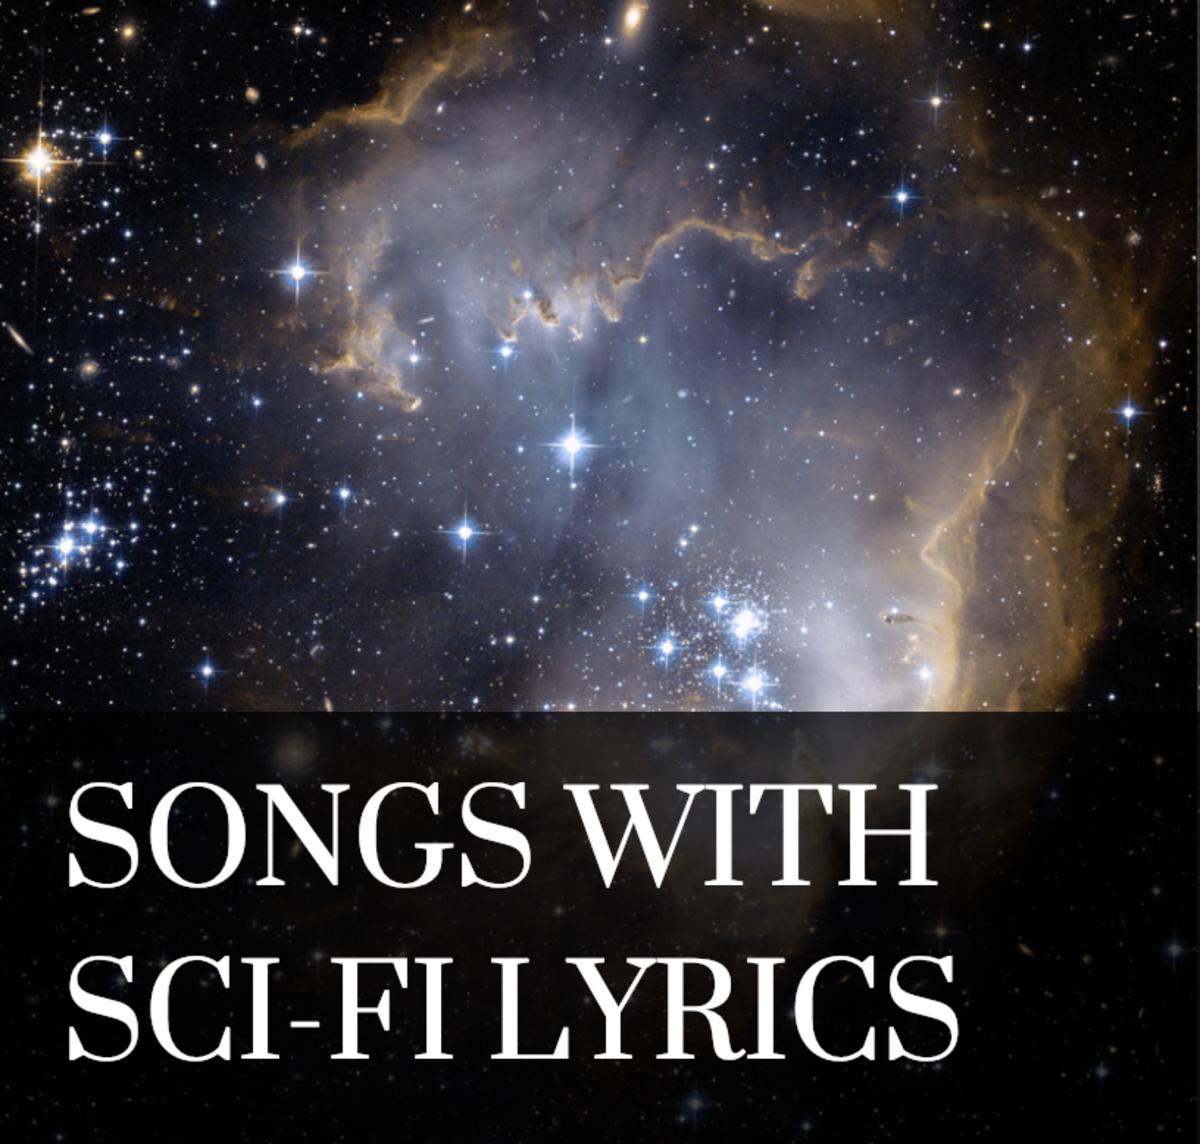 10 Songs With Sci-Fi Lyrics